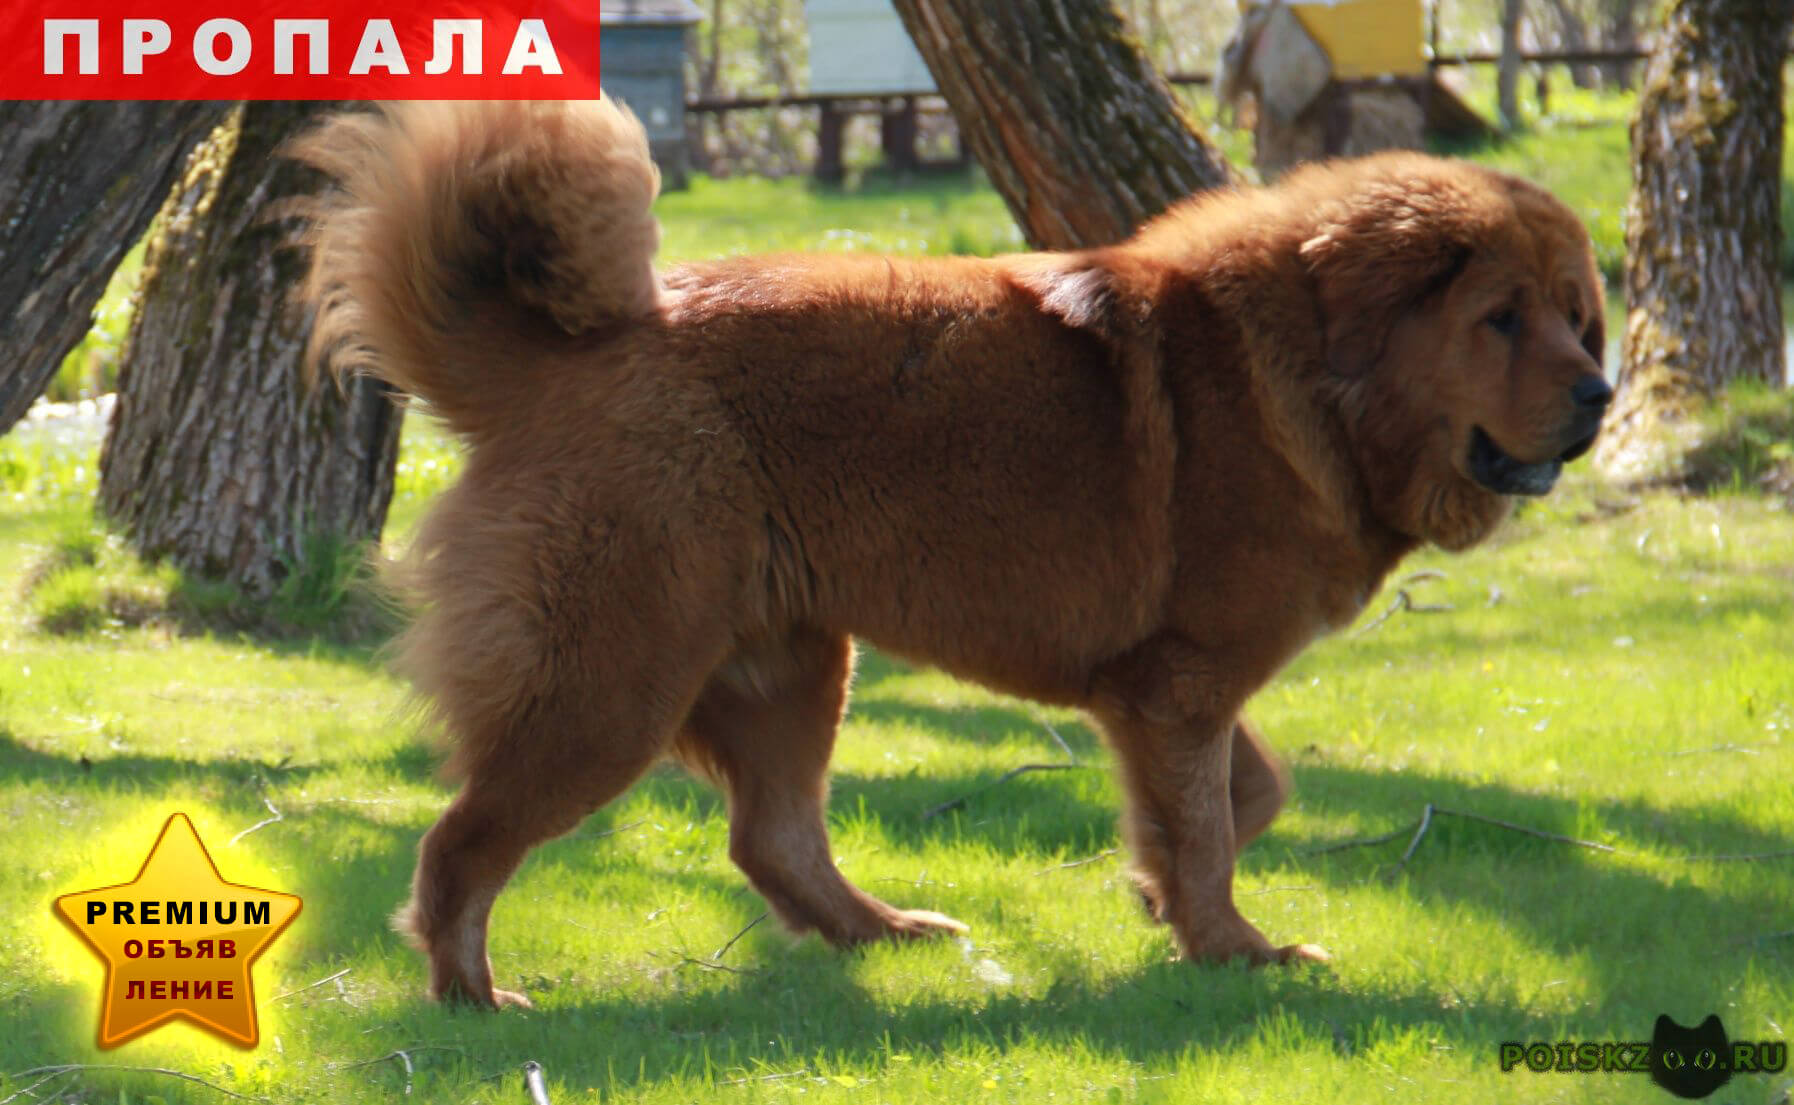 Пропала собака тибетский мастиф г.Киржач